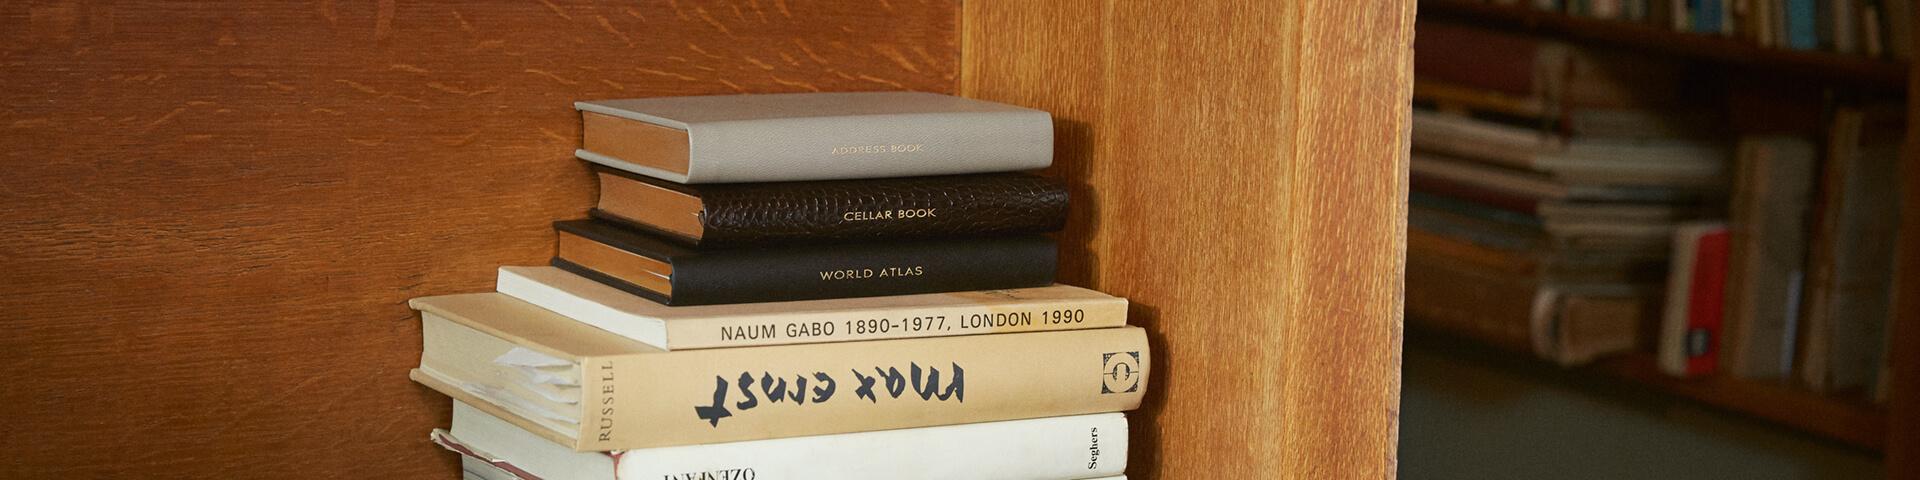 Libri e quaderni